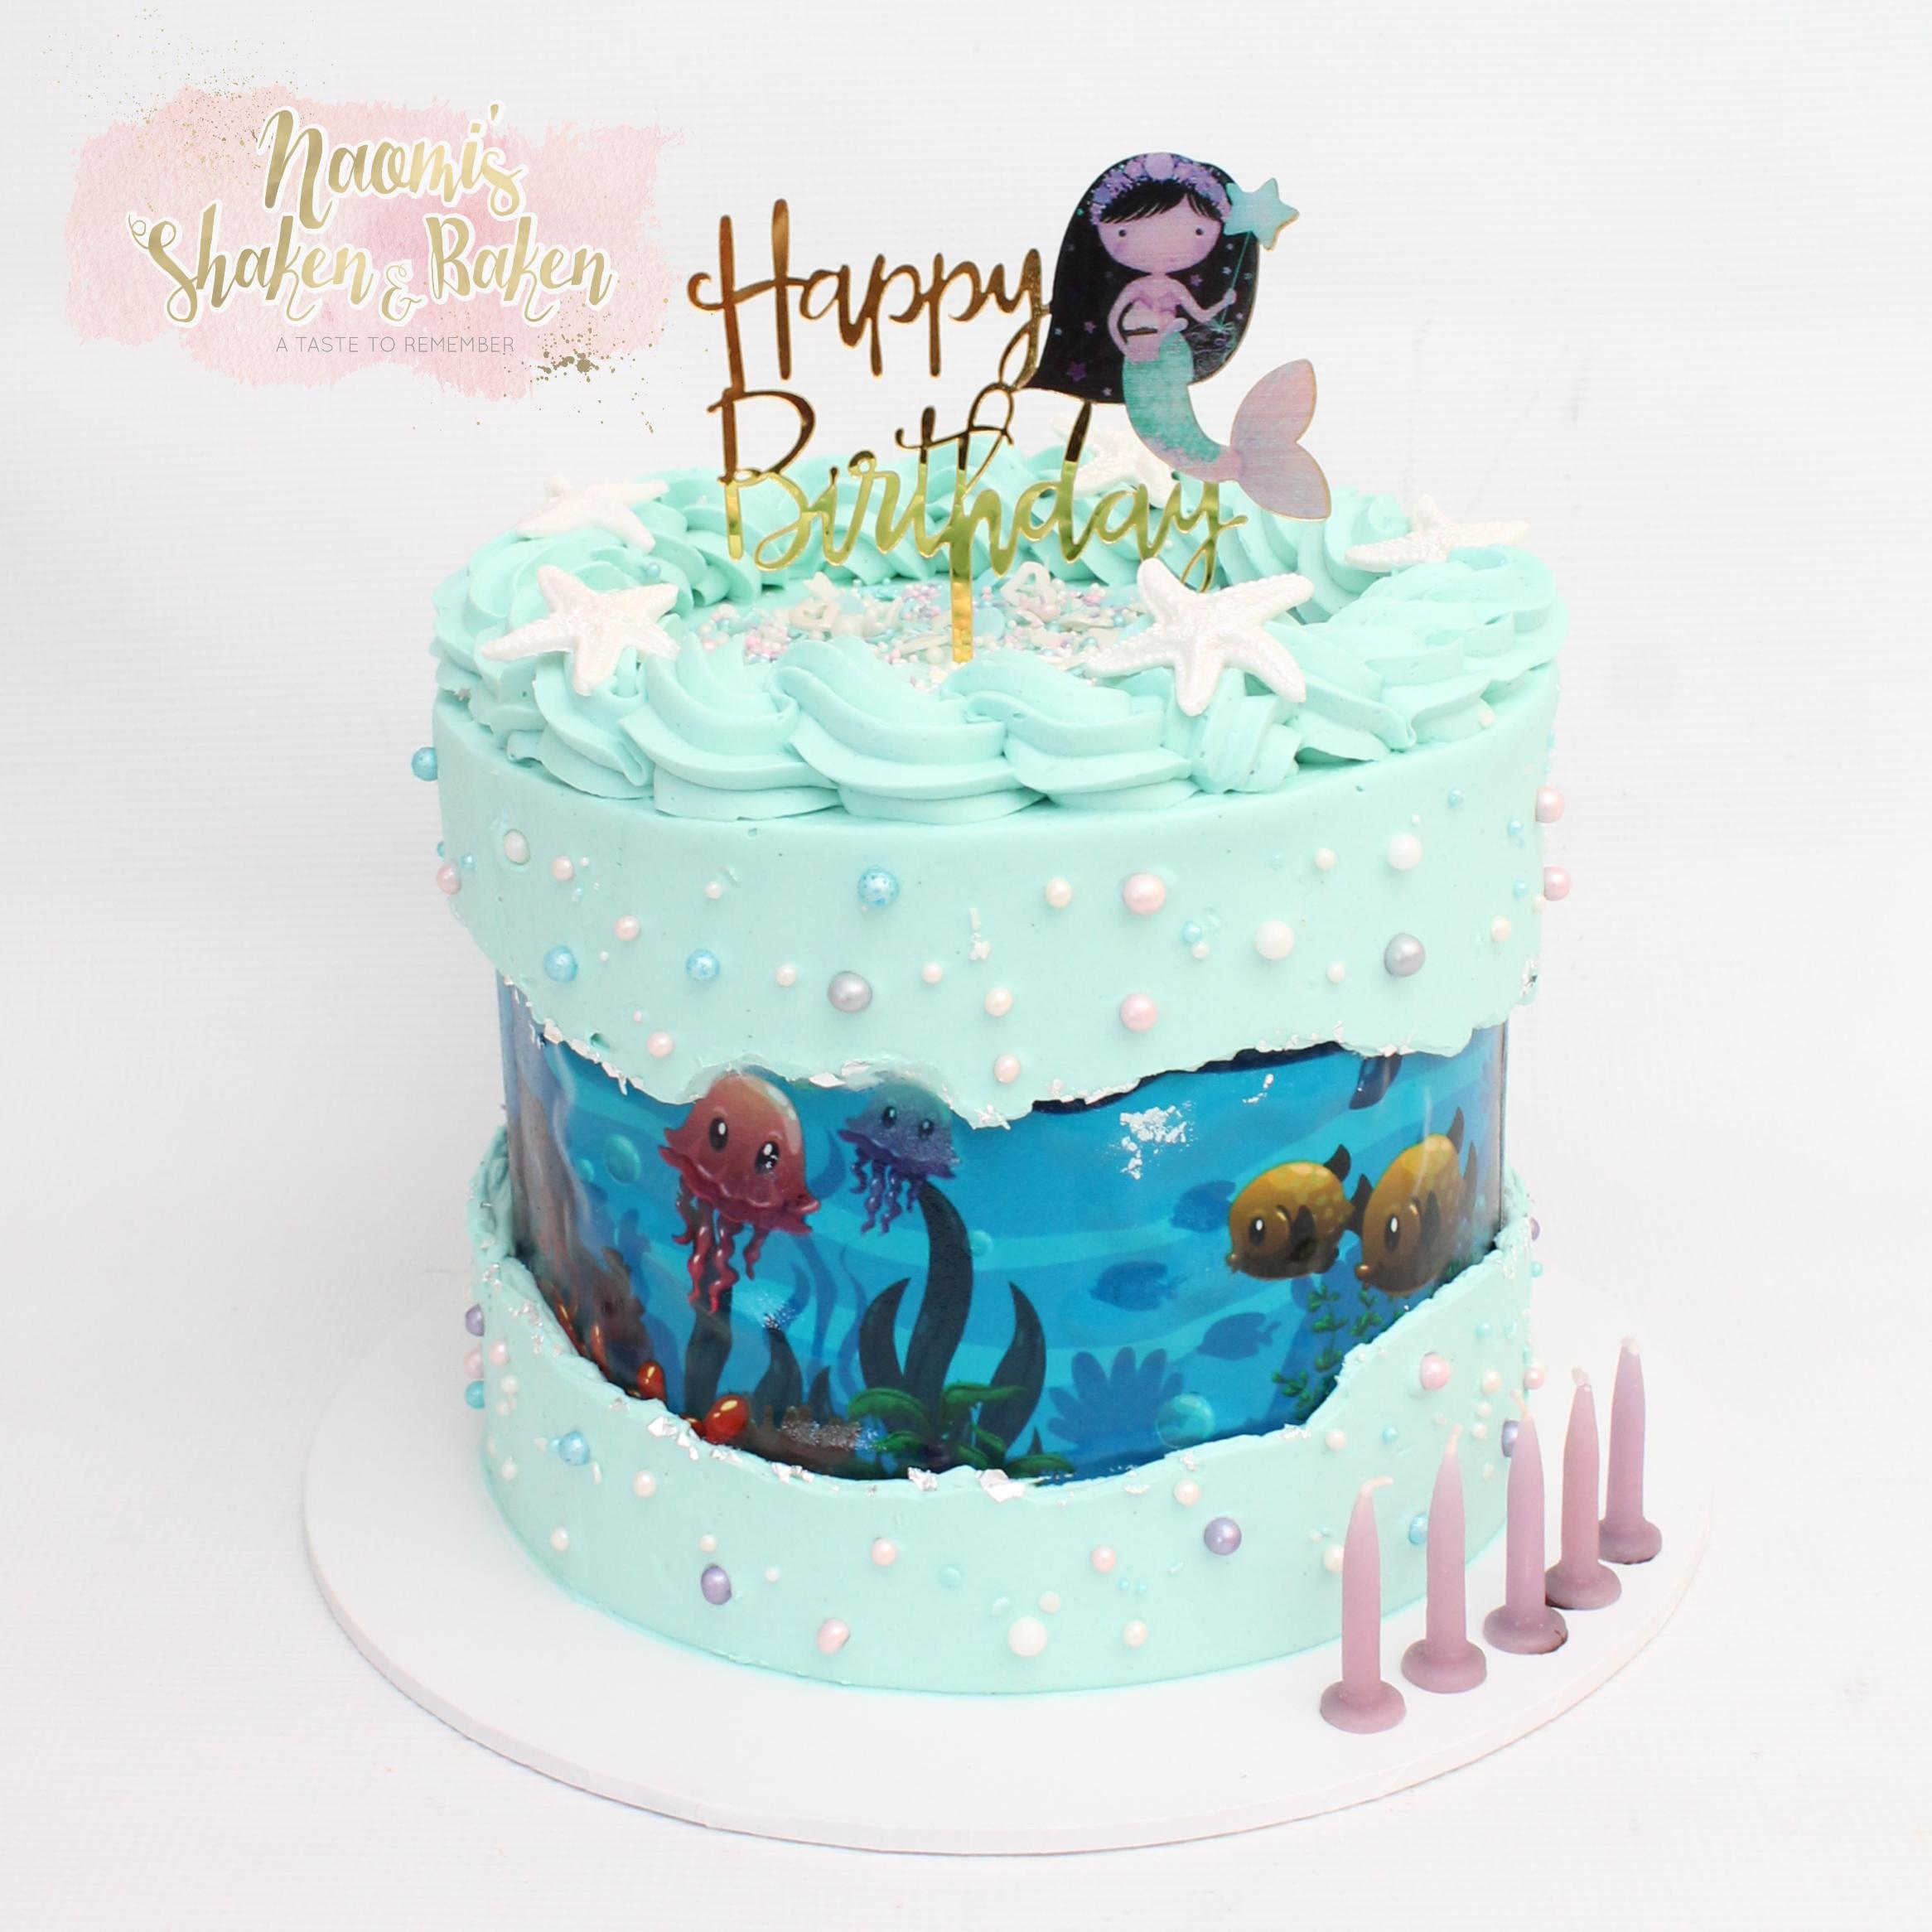 Mermaid under the sea cake